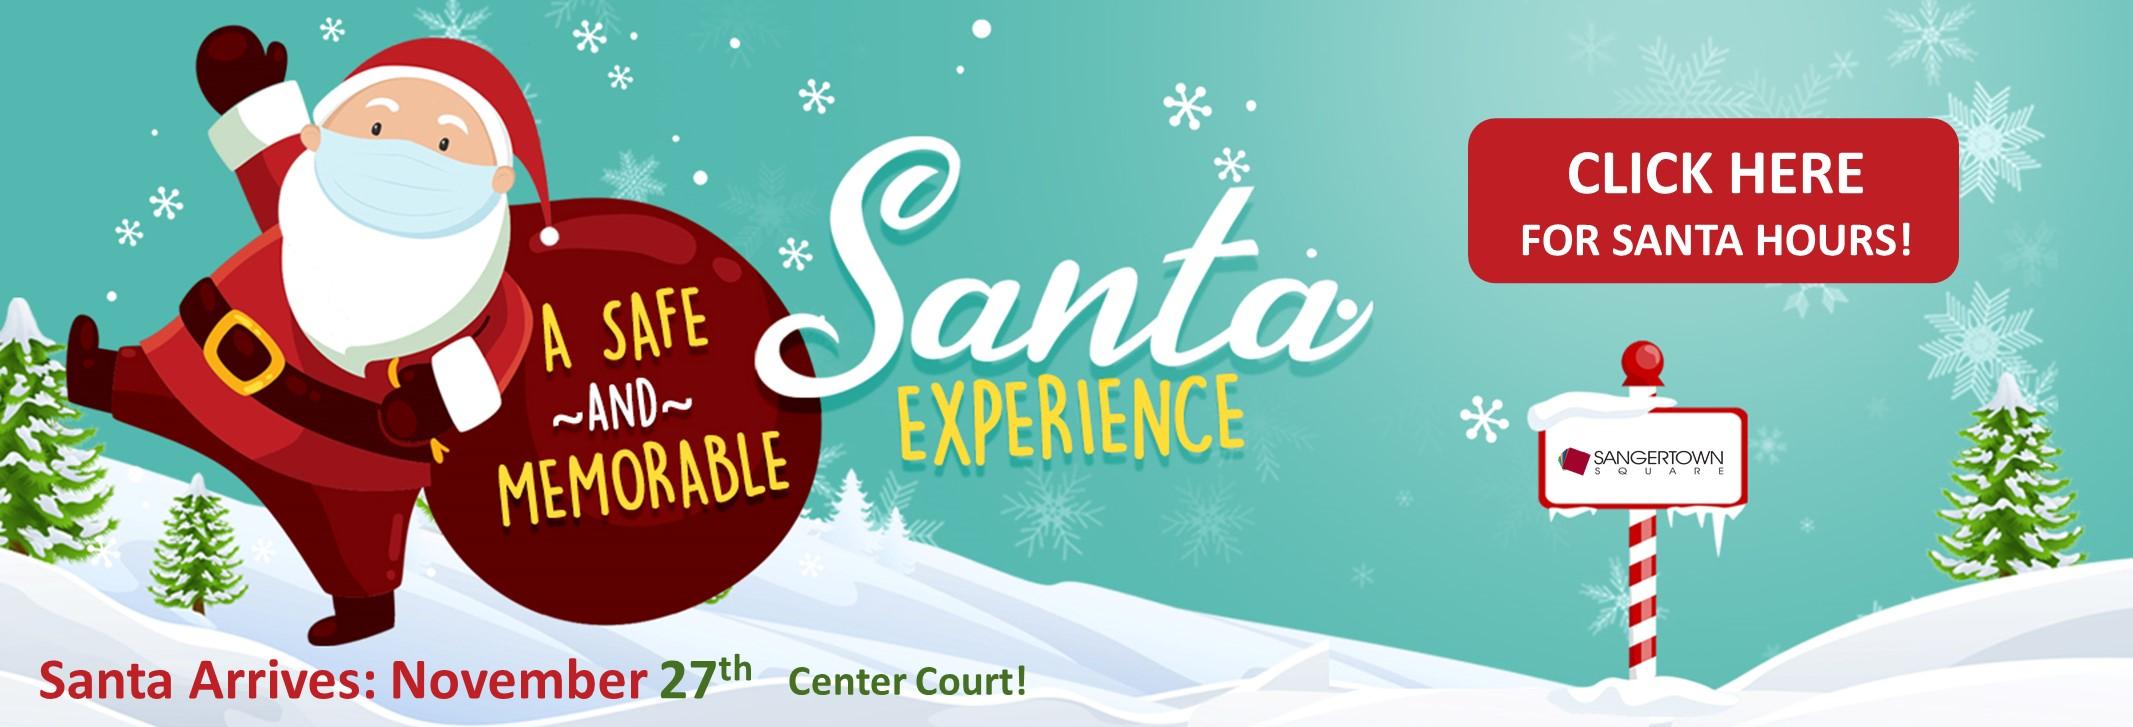 Santa Arrives on November 27th!